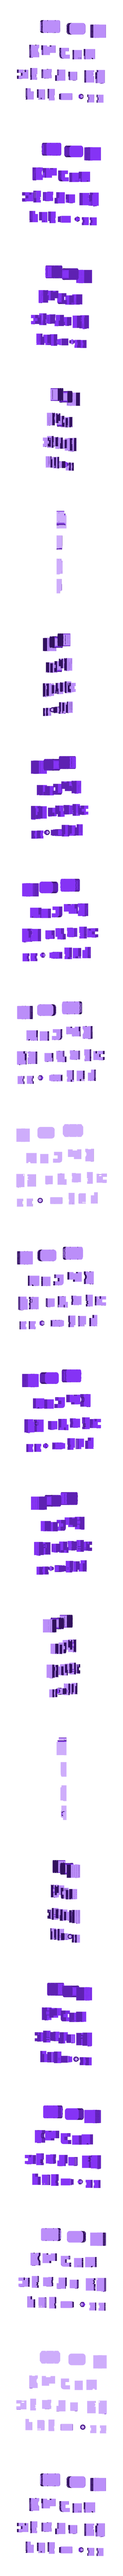 model_residence_modern.stl Download STL file Battletech 3D Printable Scifi City • 3D printable model, gametree3dprint